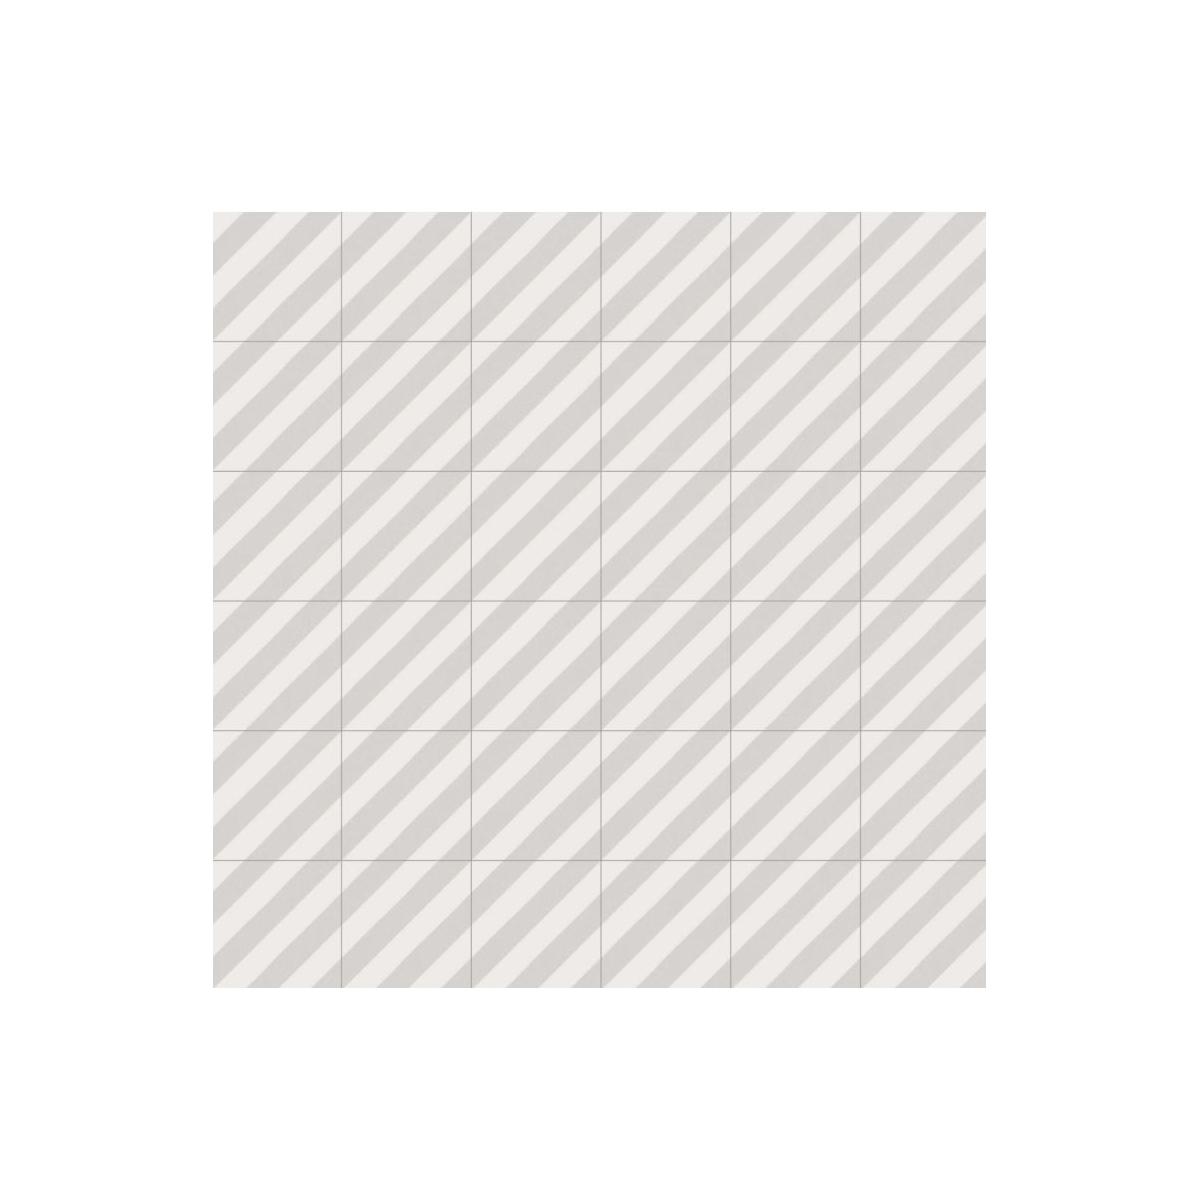 Goroka Gris (m2) - Pavimento hidráulico Porcelánico antideslizante - Serie Maori